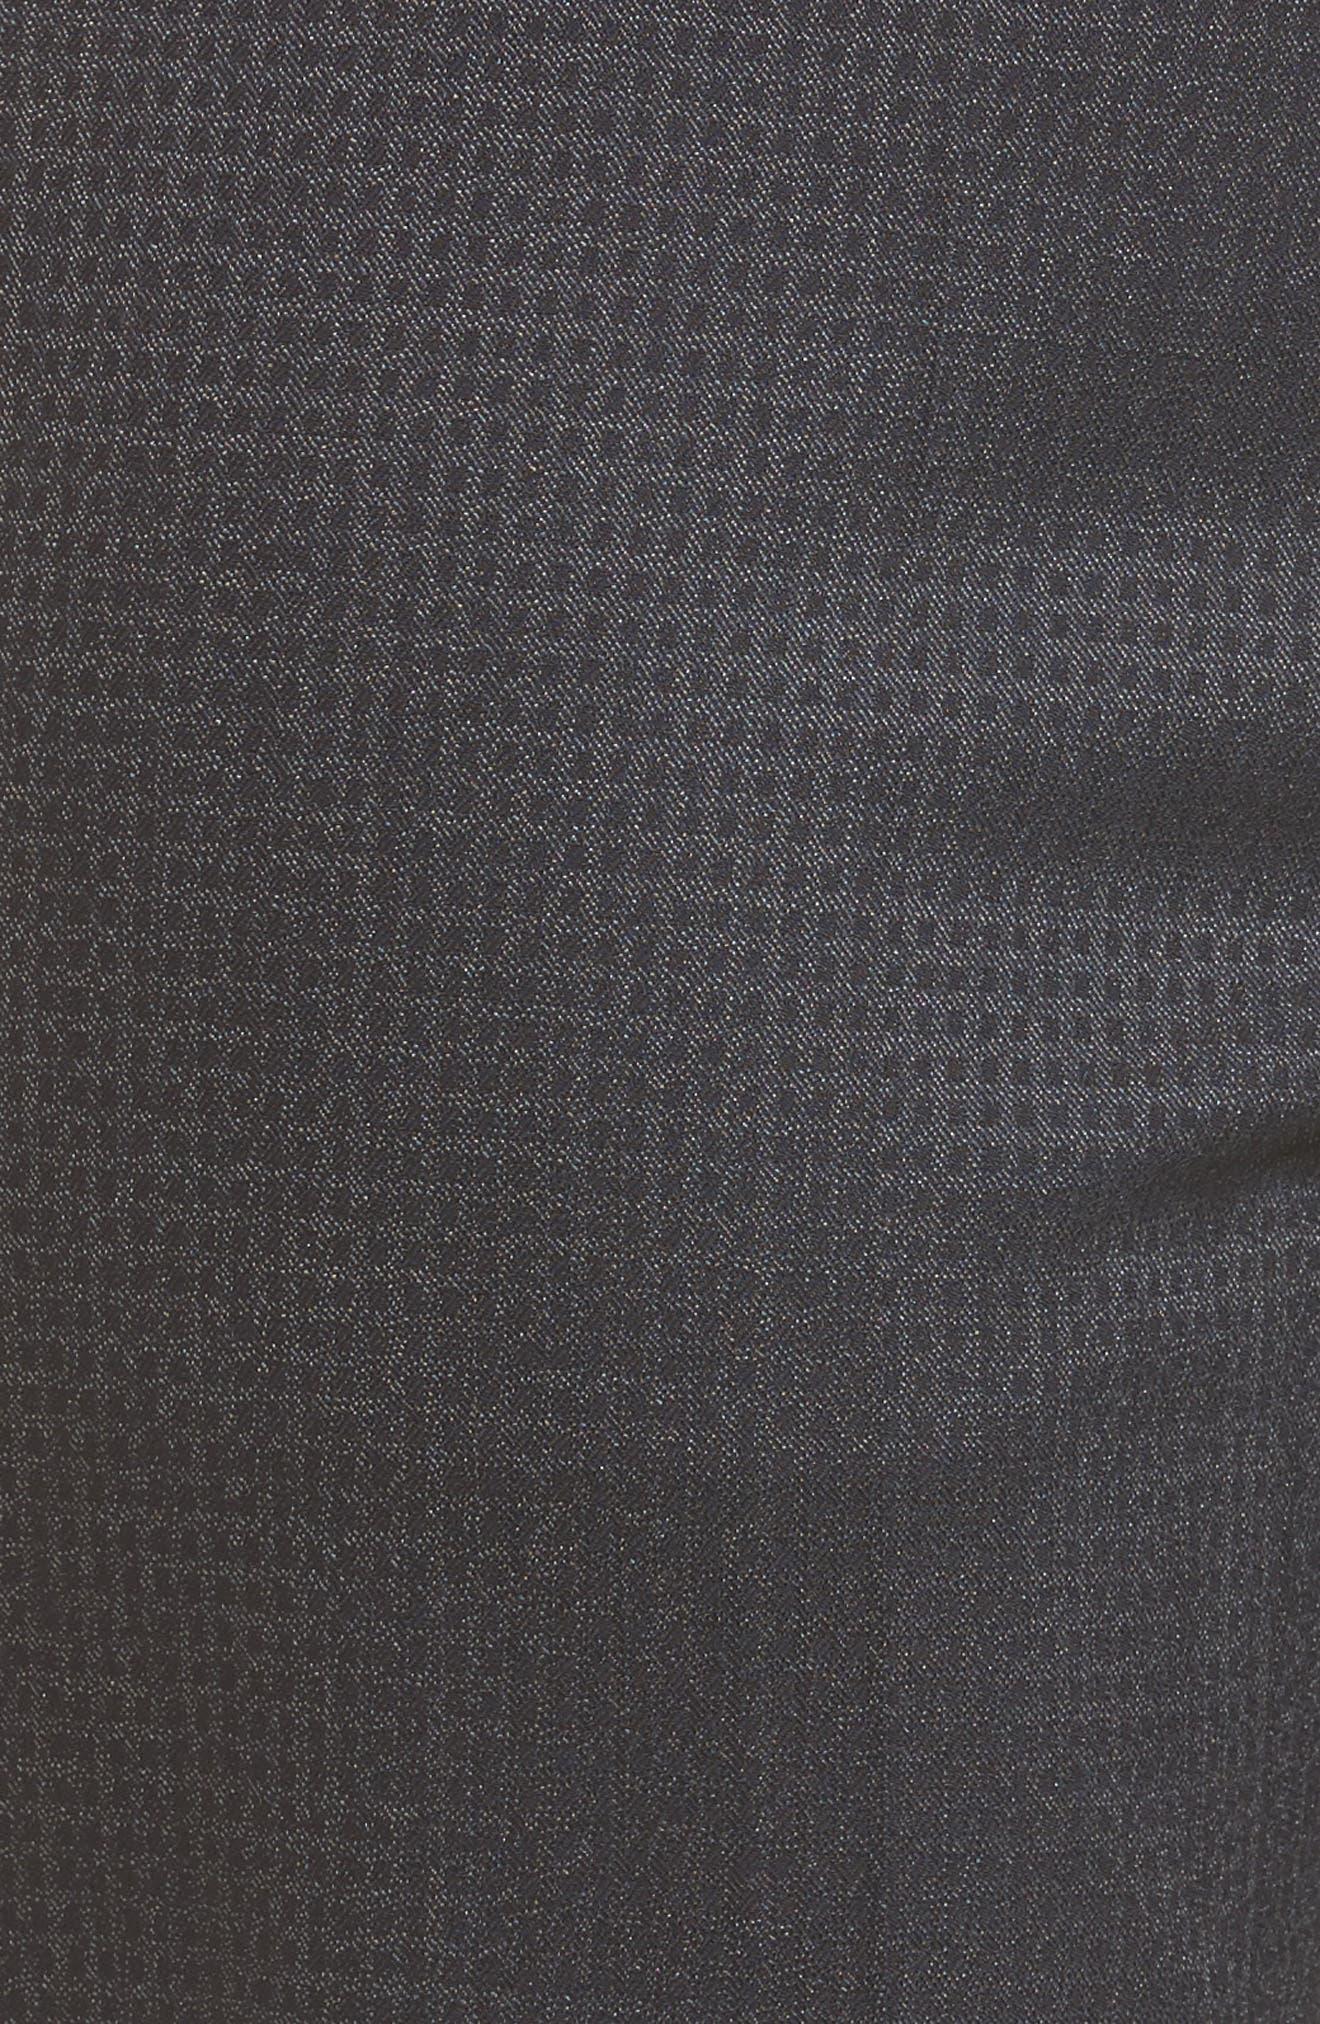 Tamea Stretch Wool Straight Leg Trousers,                             Alternate thumbnail 5, color,                             461